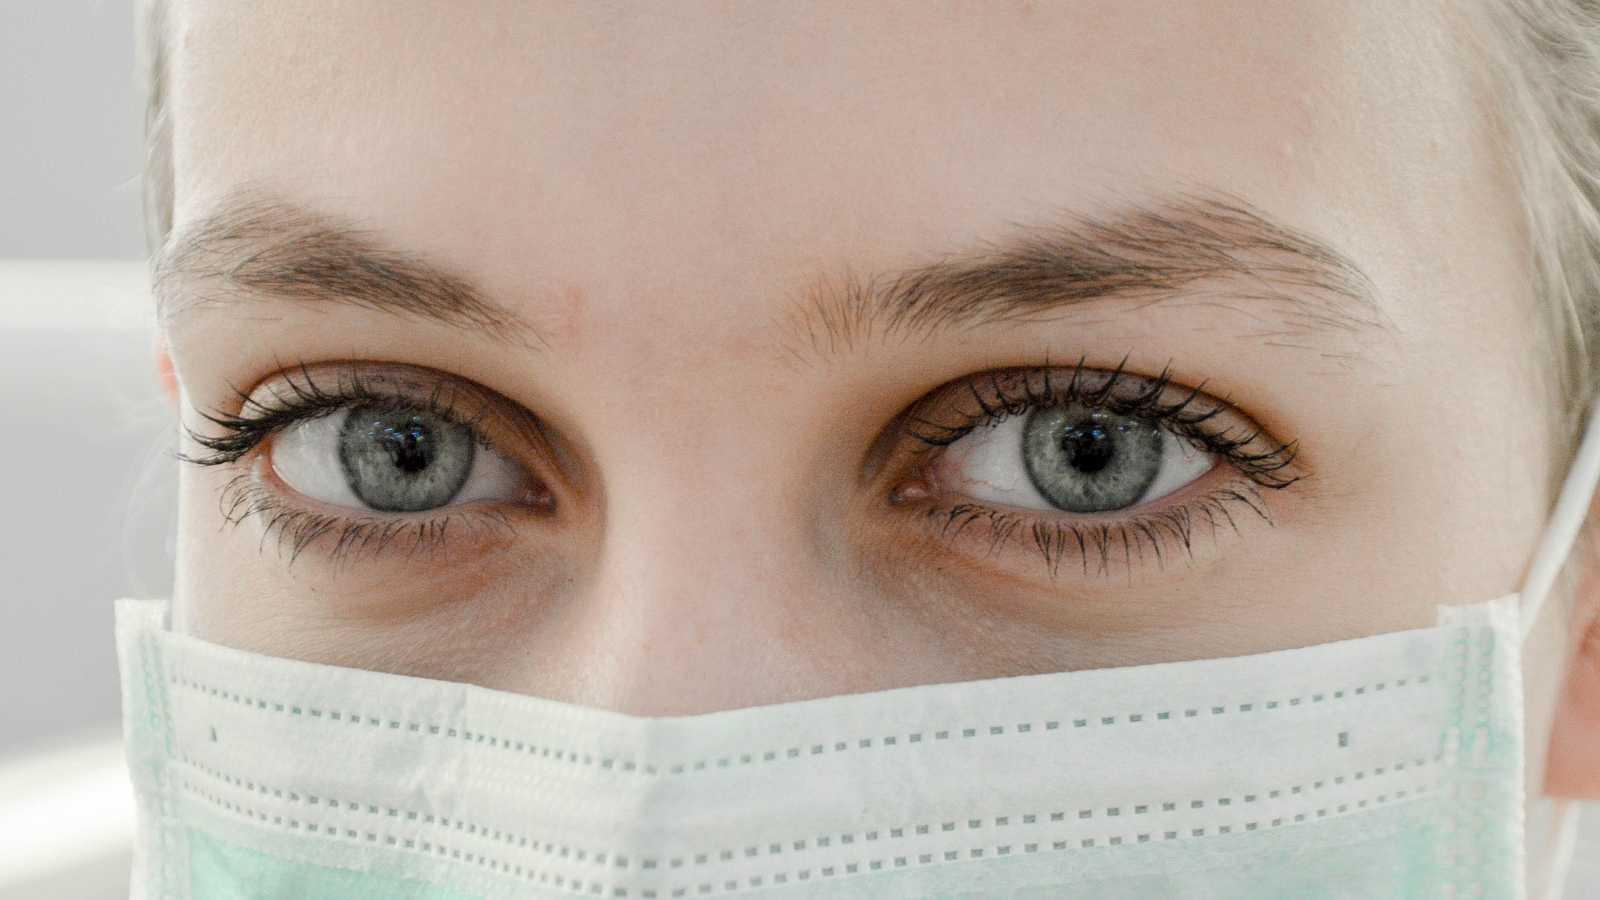 Mª Carmen Acosta: Cómo evitar la fatiga ocular - escuchar ahora